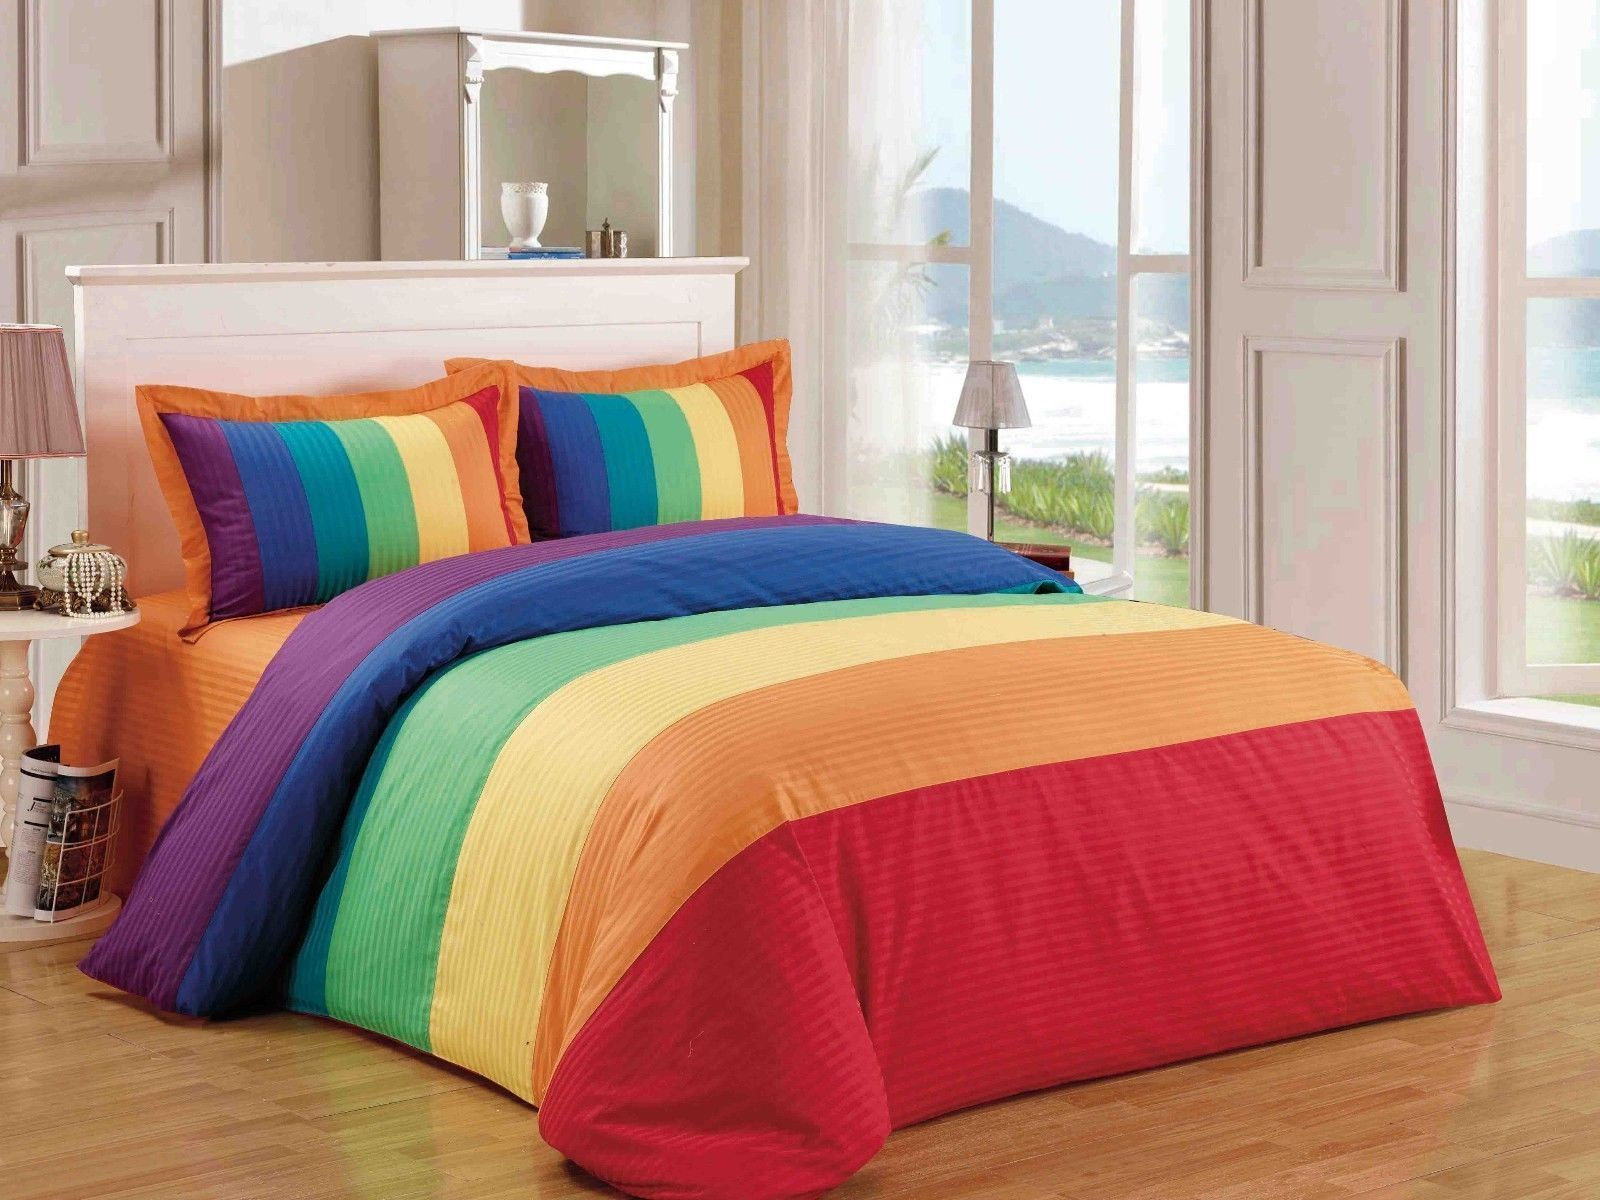 5 Pc Queen Size Rainbow Comforter Duvet Cover shrink